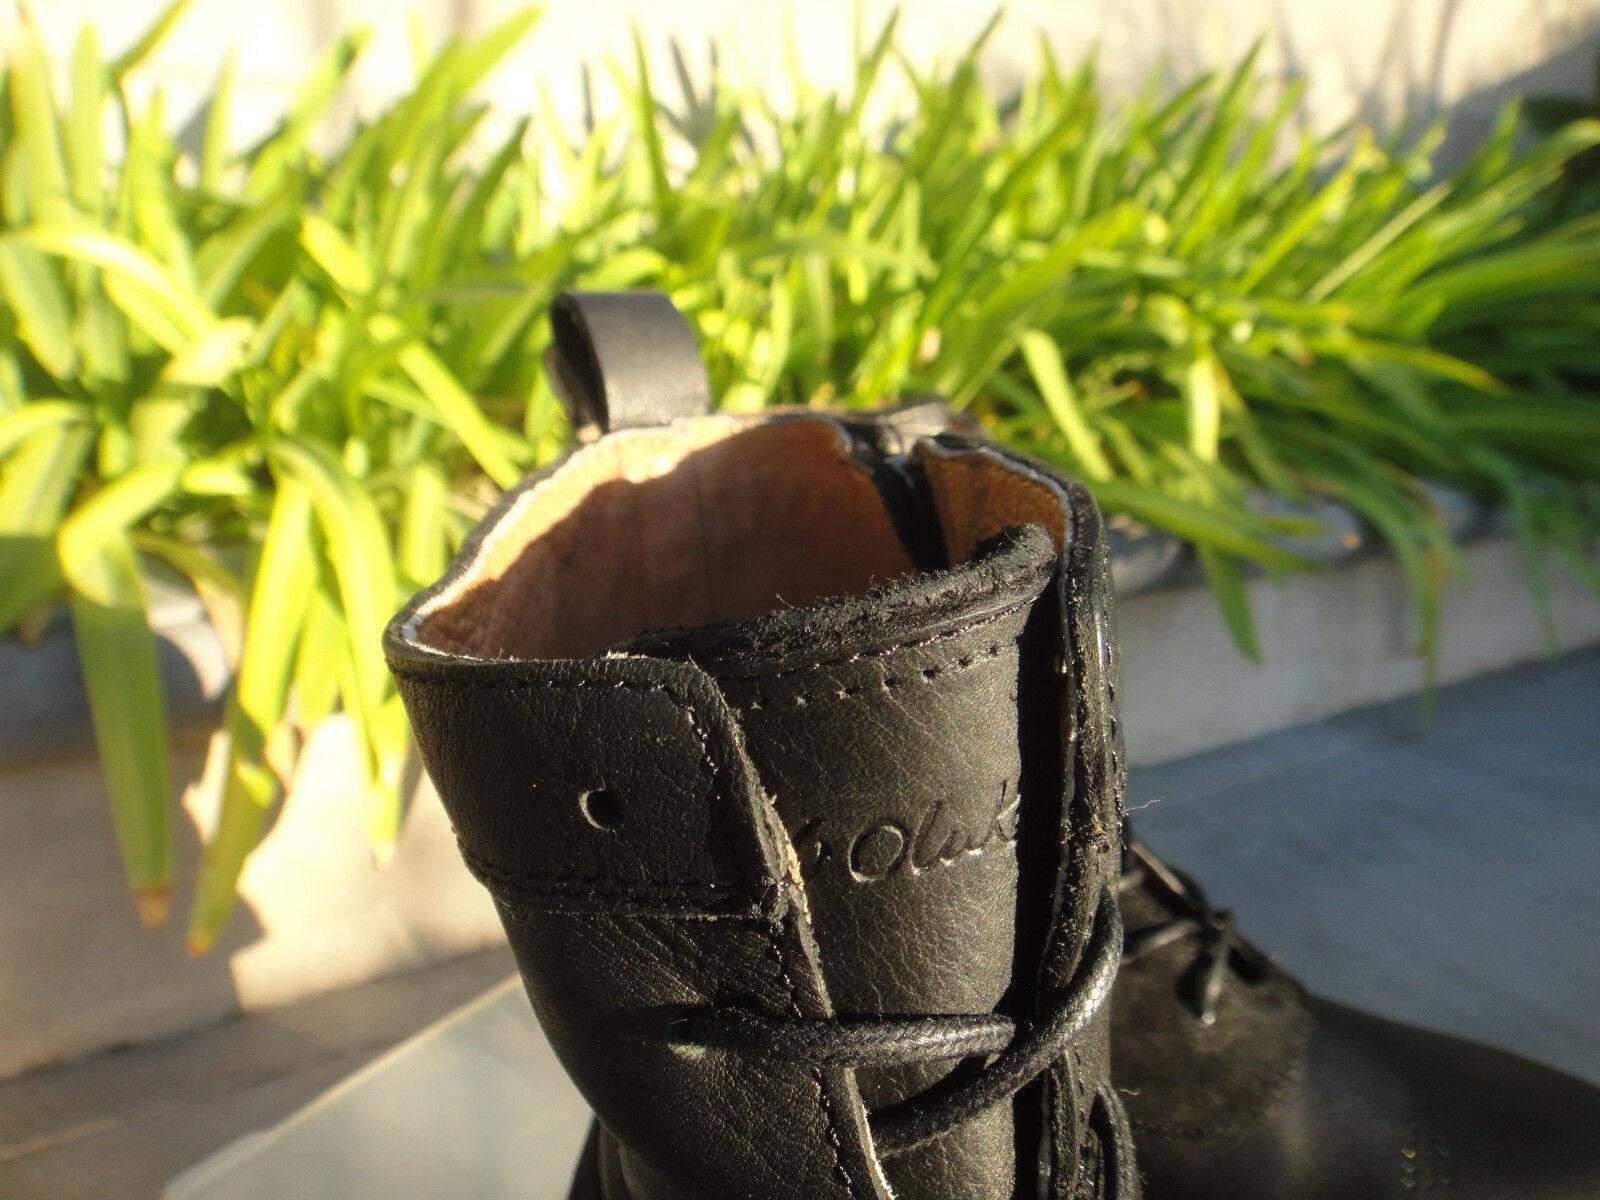 OluKai NANI KAMEA, Inside Zip Lace BROGUE Up BROGUE Lace Stiefel Damenschuhe' Sz US7M, NWOT 7fb040